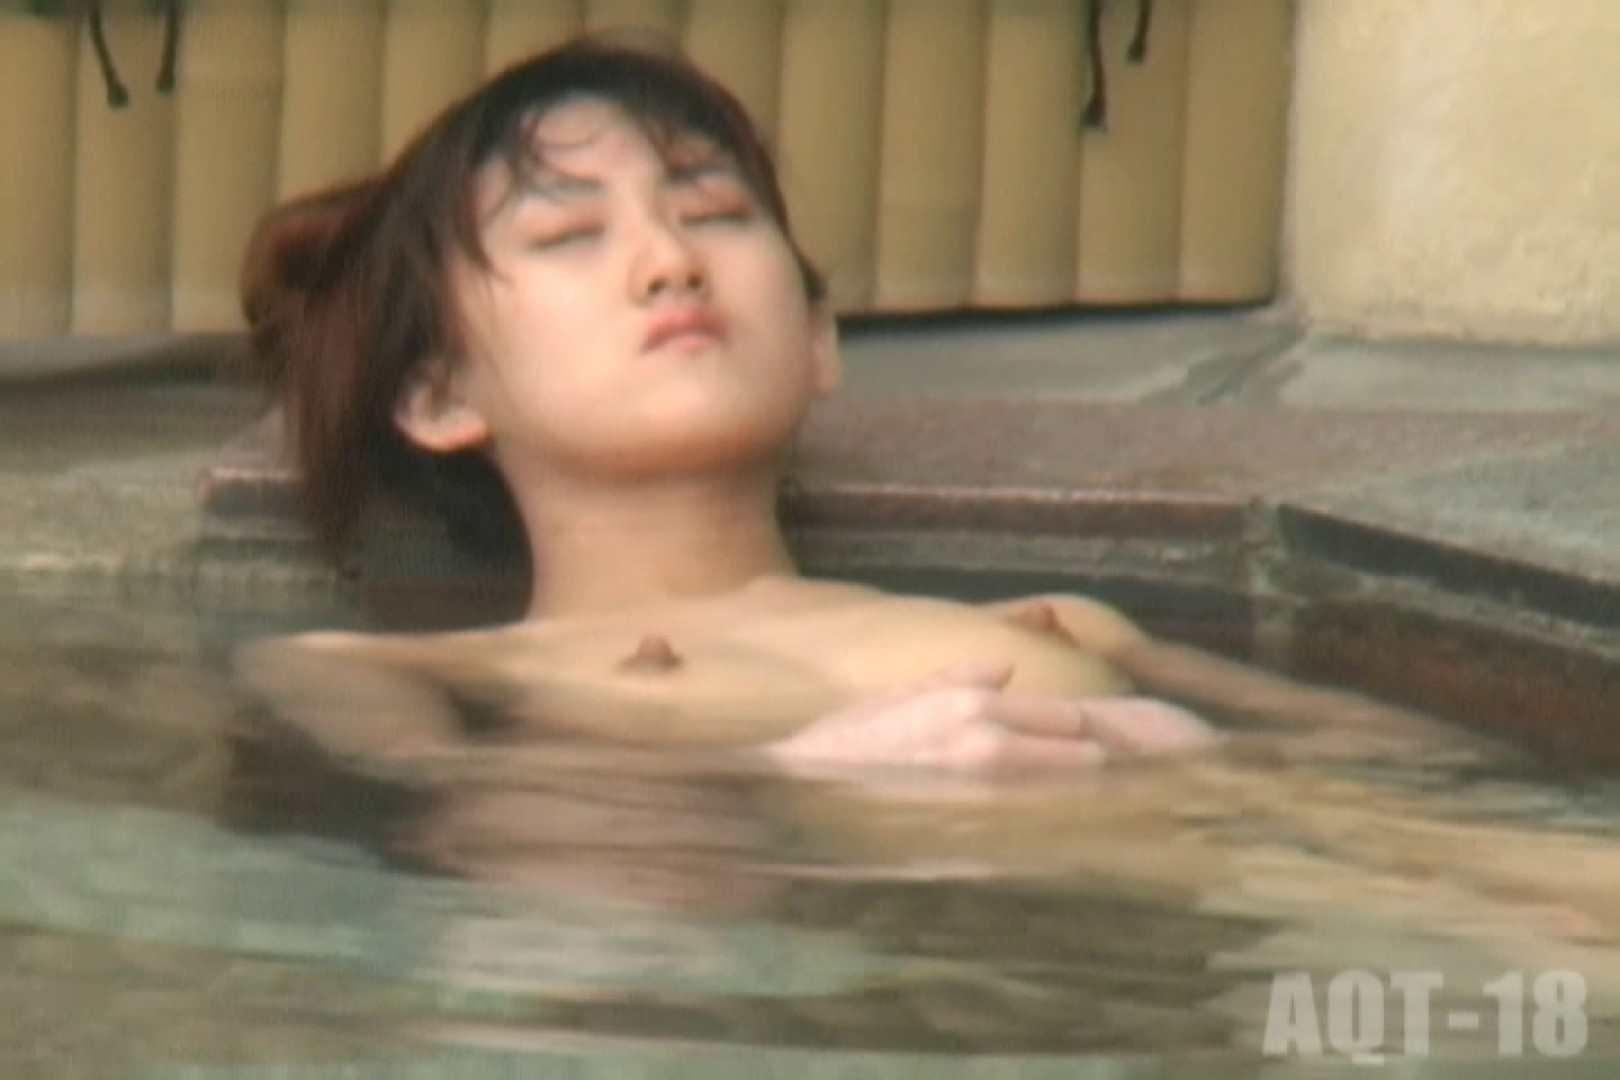 Aquaな露天風呂Vol.862 美しいOLの裸体 戯れ無修正画像 99pic 44